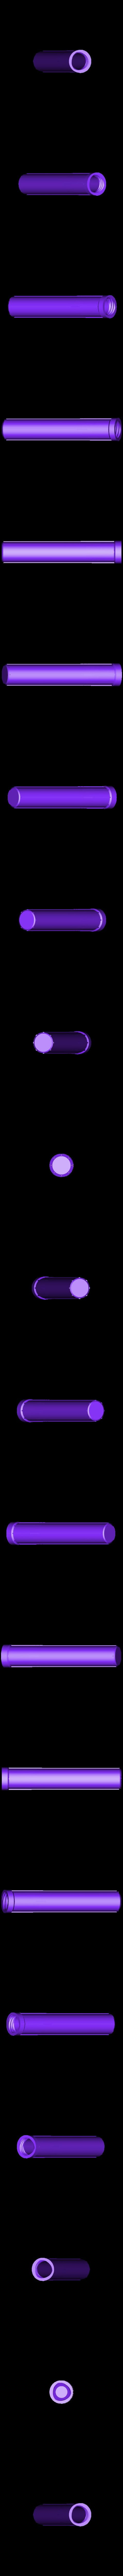 BatterySlot_Body_19.8mm.stl Download free STL file Bike Handlebar AA Battery Slot • 3D printable model, CyberCyclist